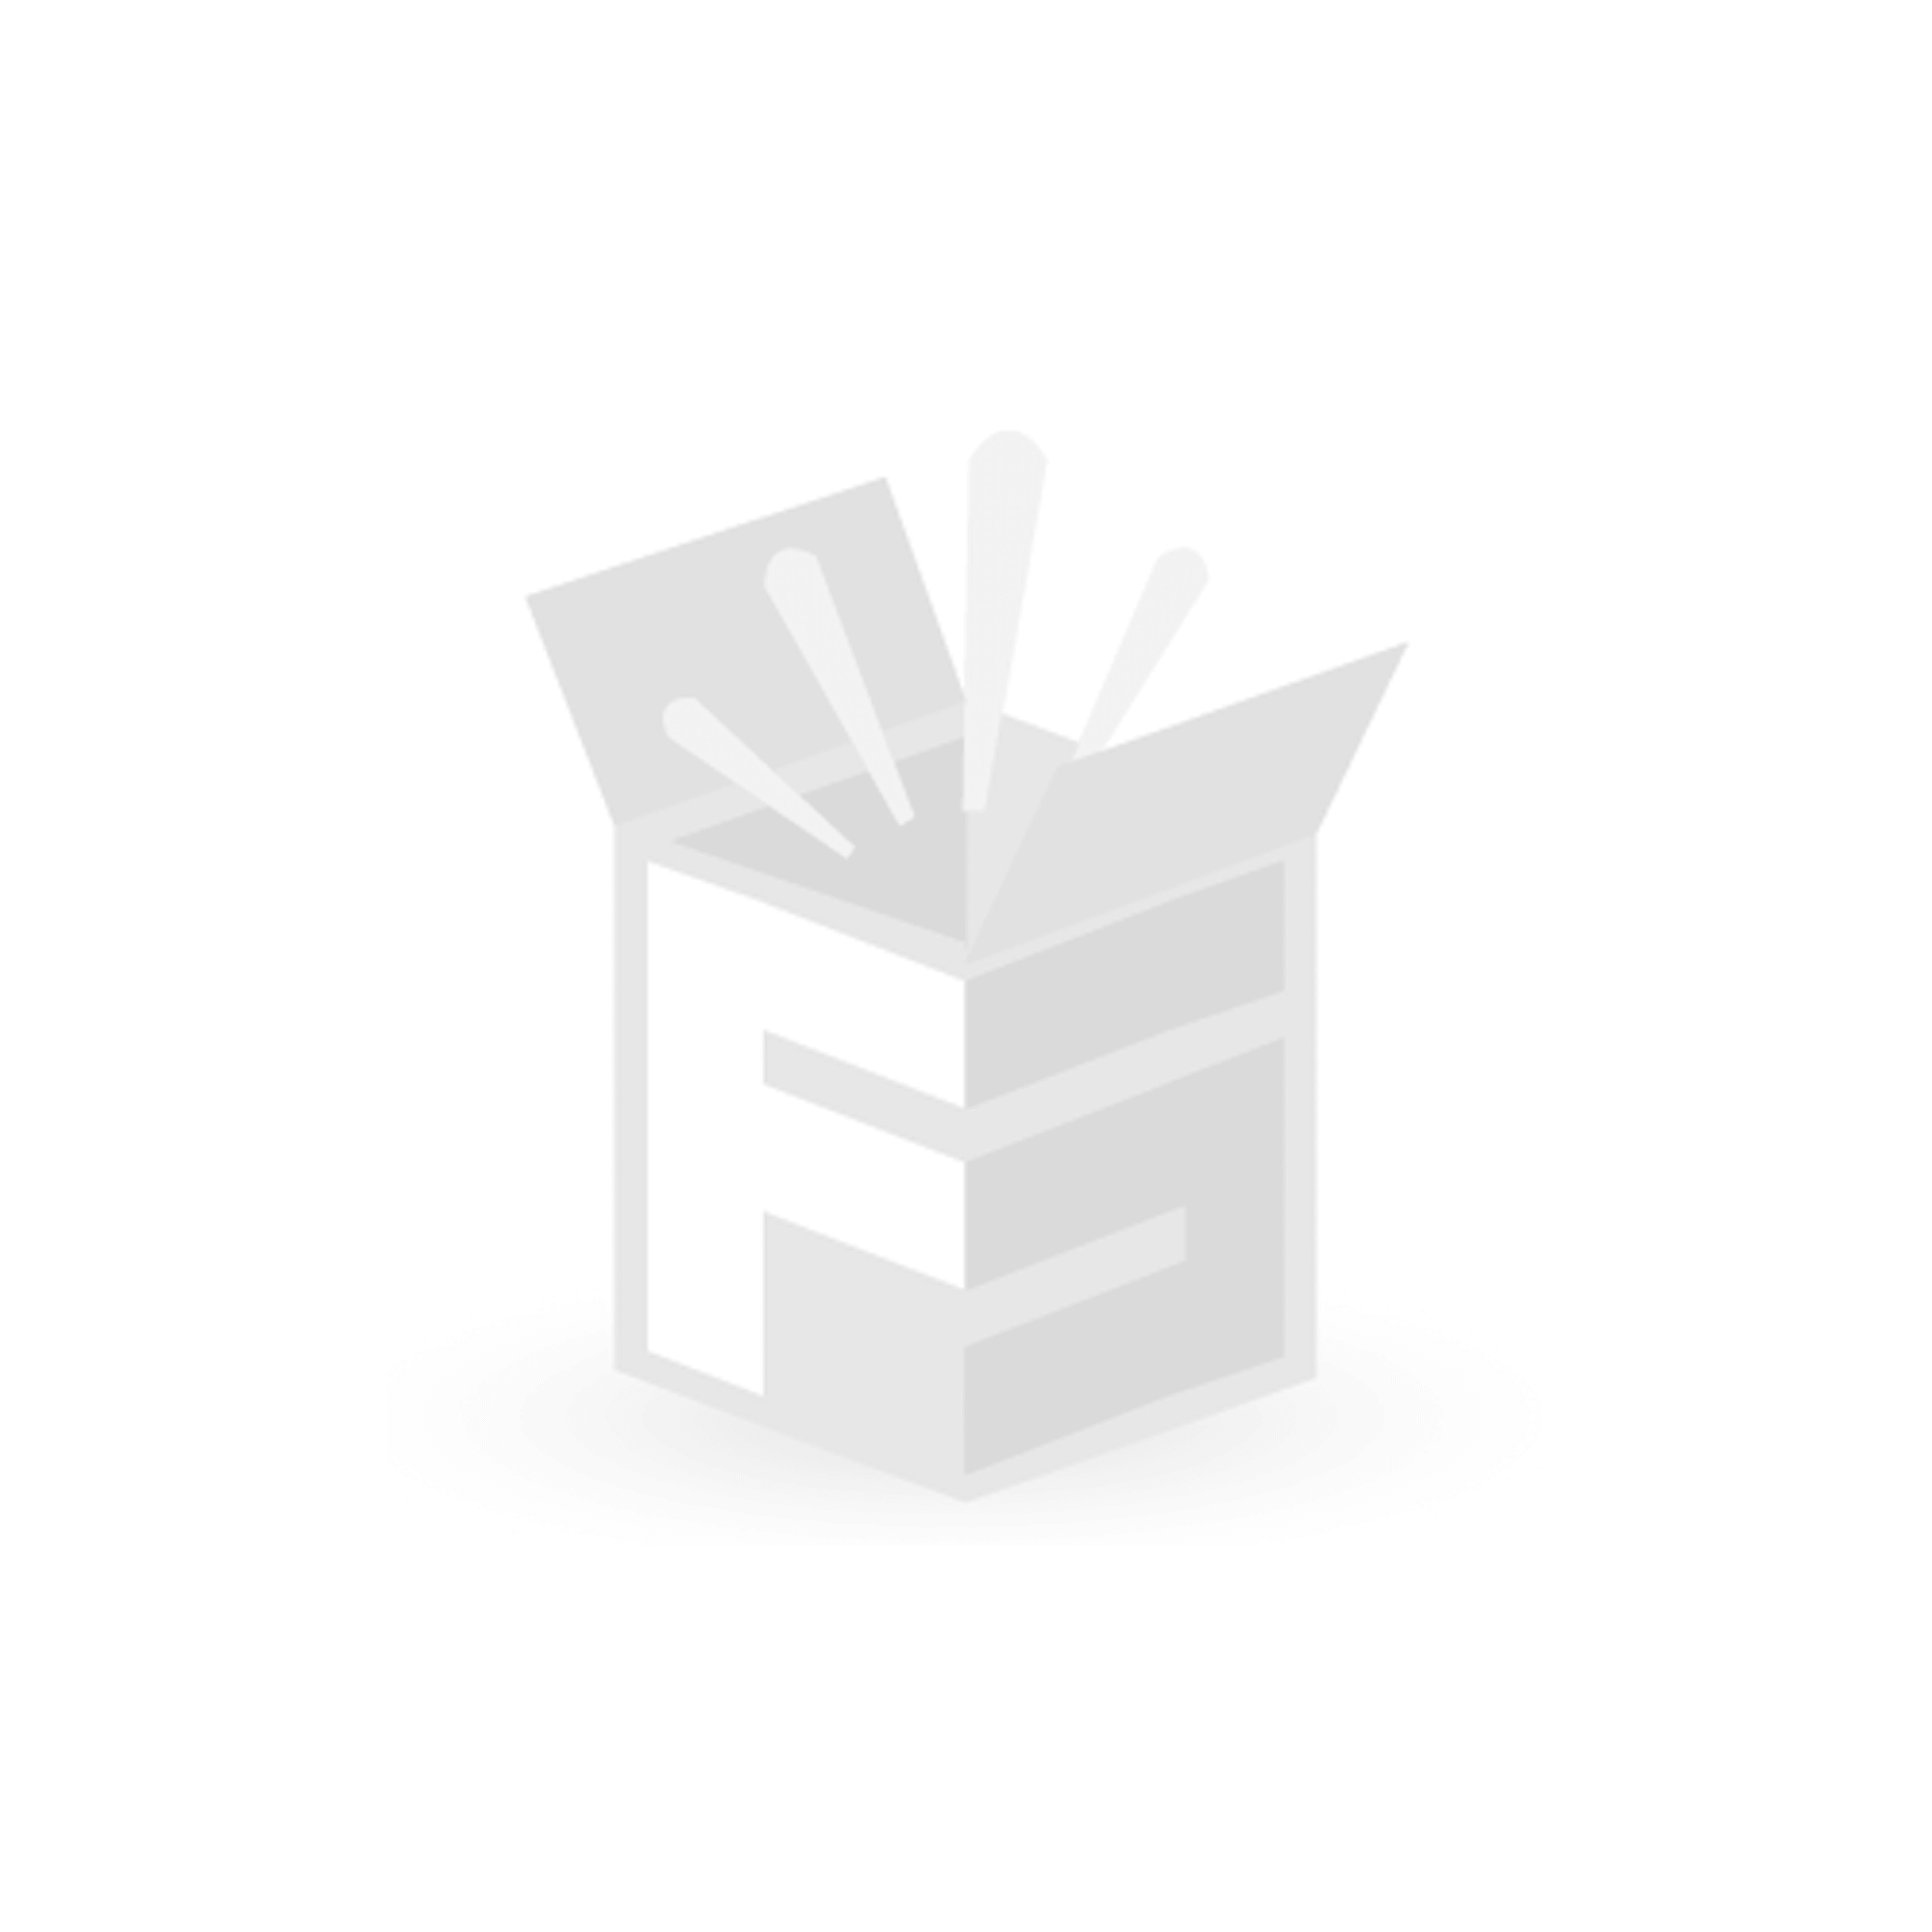 Kibernetik Kupplung 1x CEE16A, 5-polig